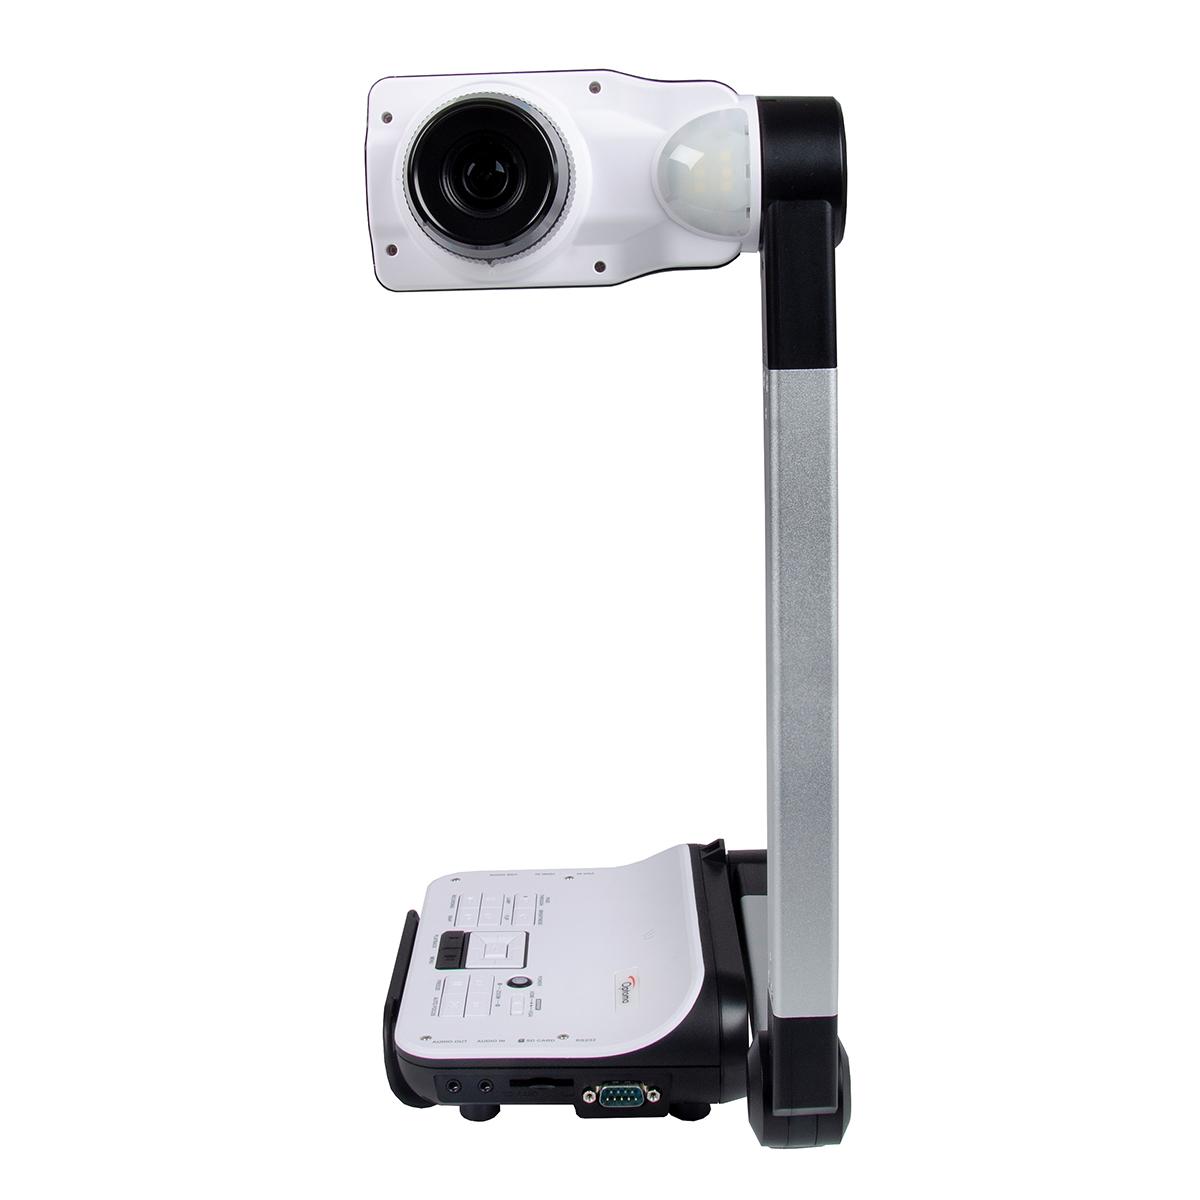 Optoma DC552 13MP Document Camera